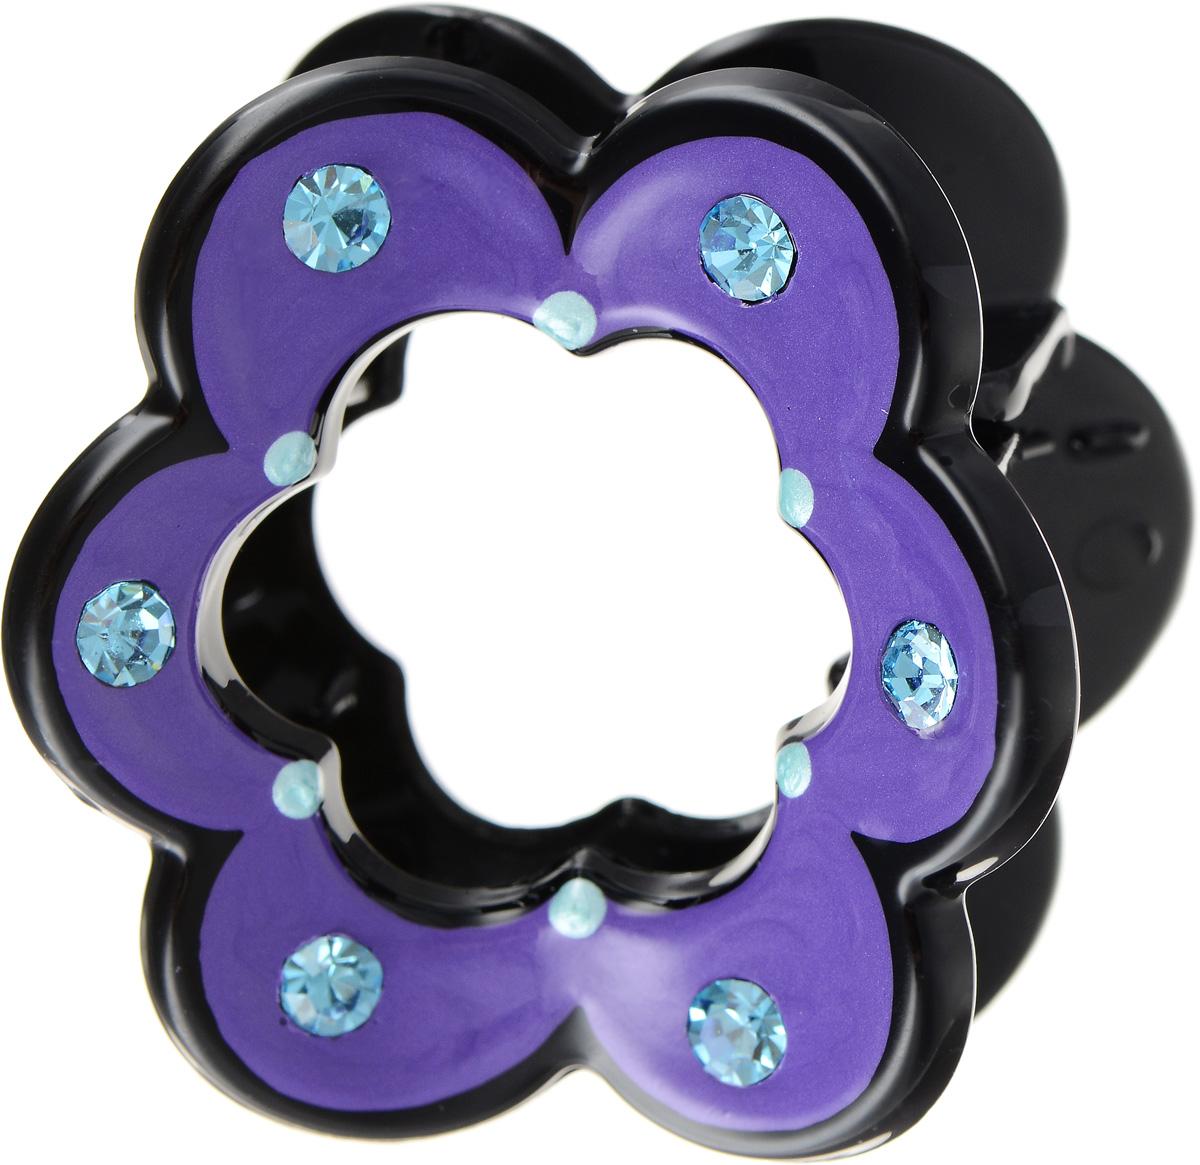 "Заколка-краб ""Selena"", цвет: сиреневый, черный. 70064253 Selena Селена"